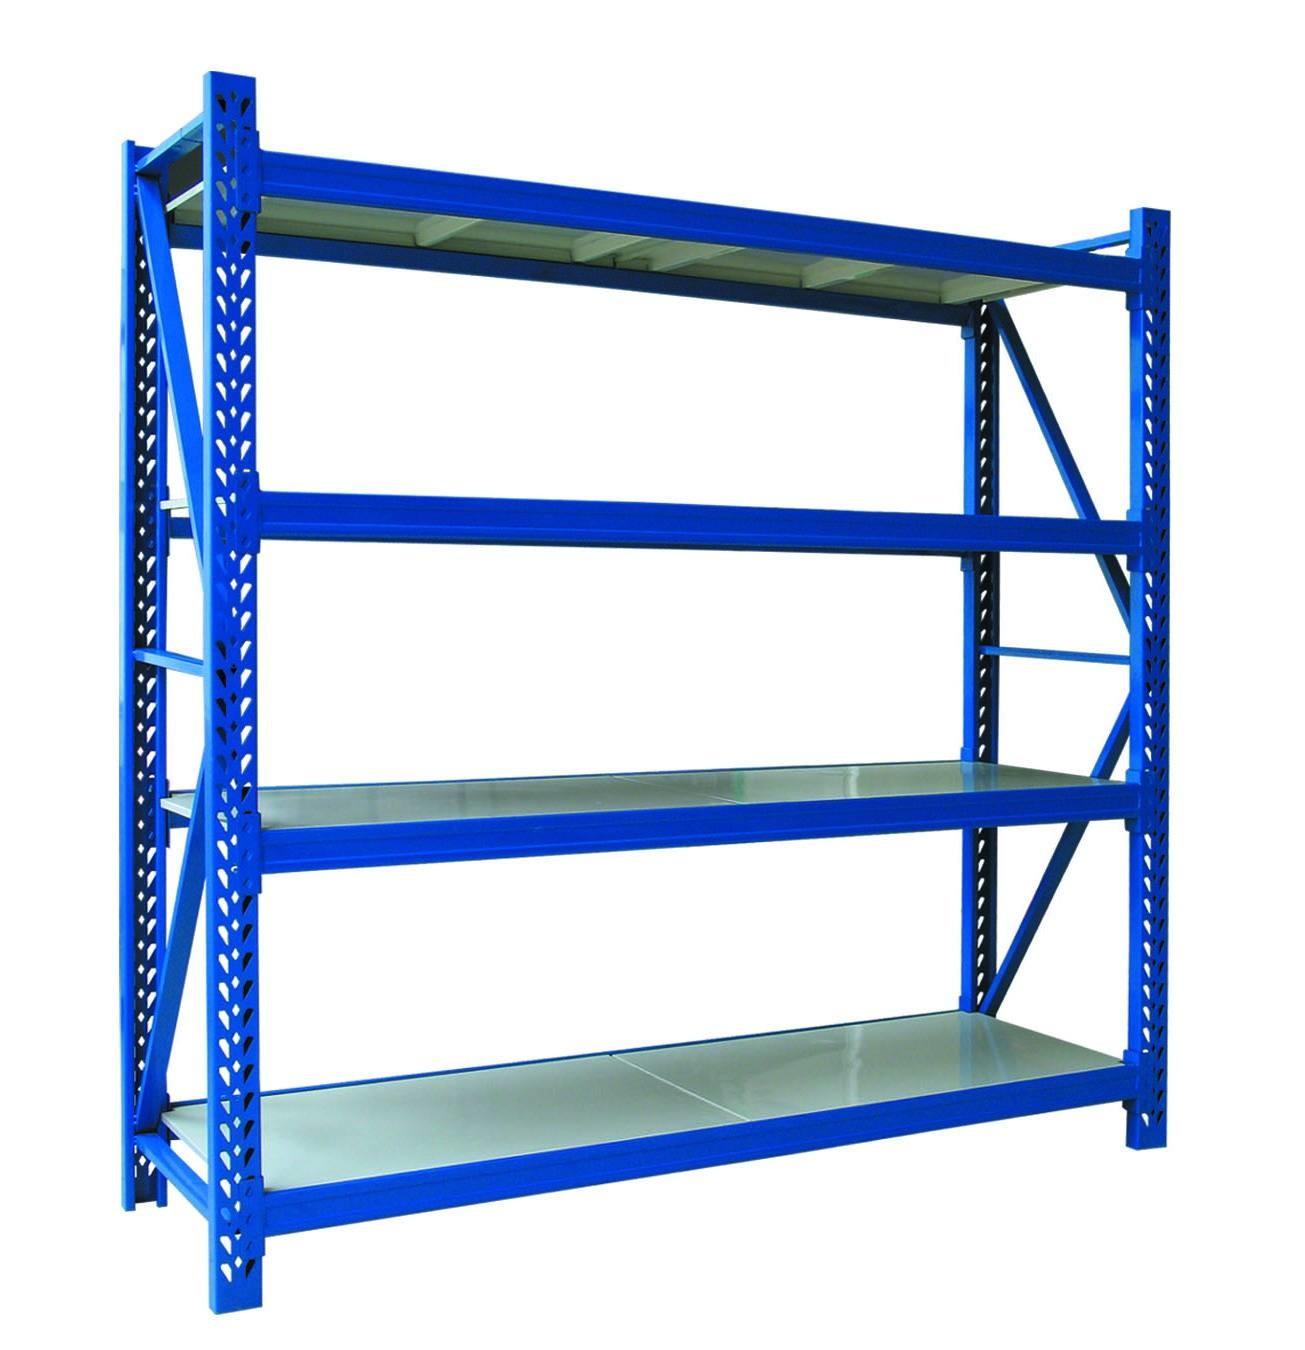 Flexible Metal Warehouse Shelving Industrial Storage Racks